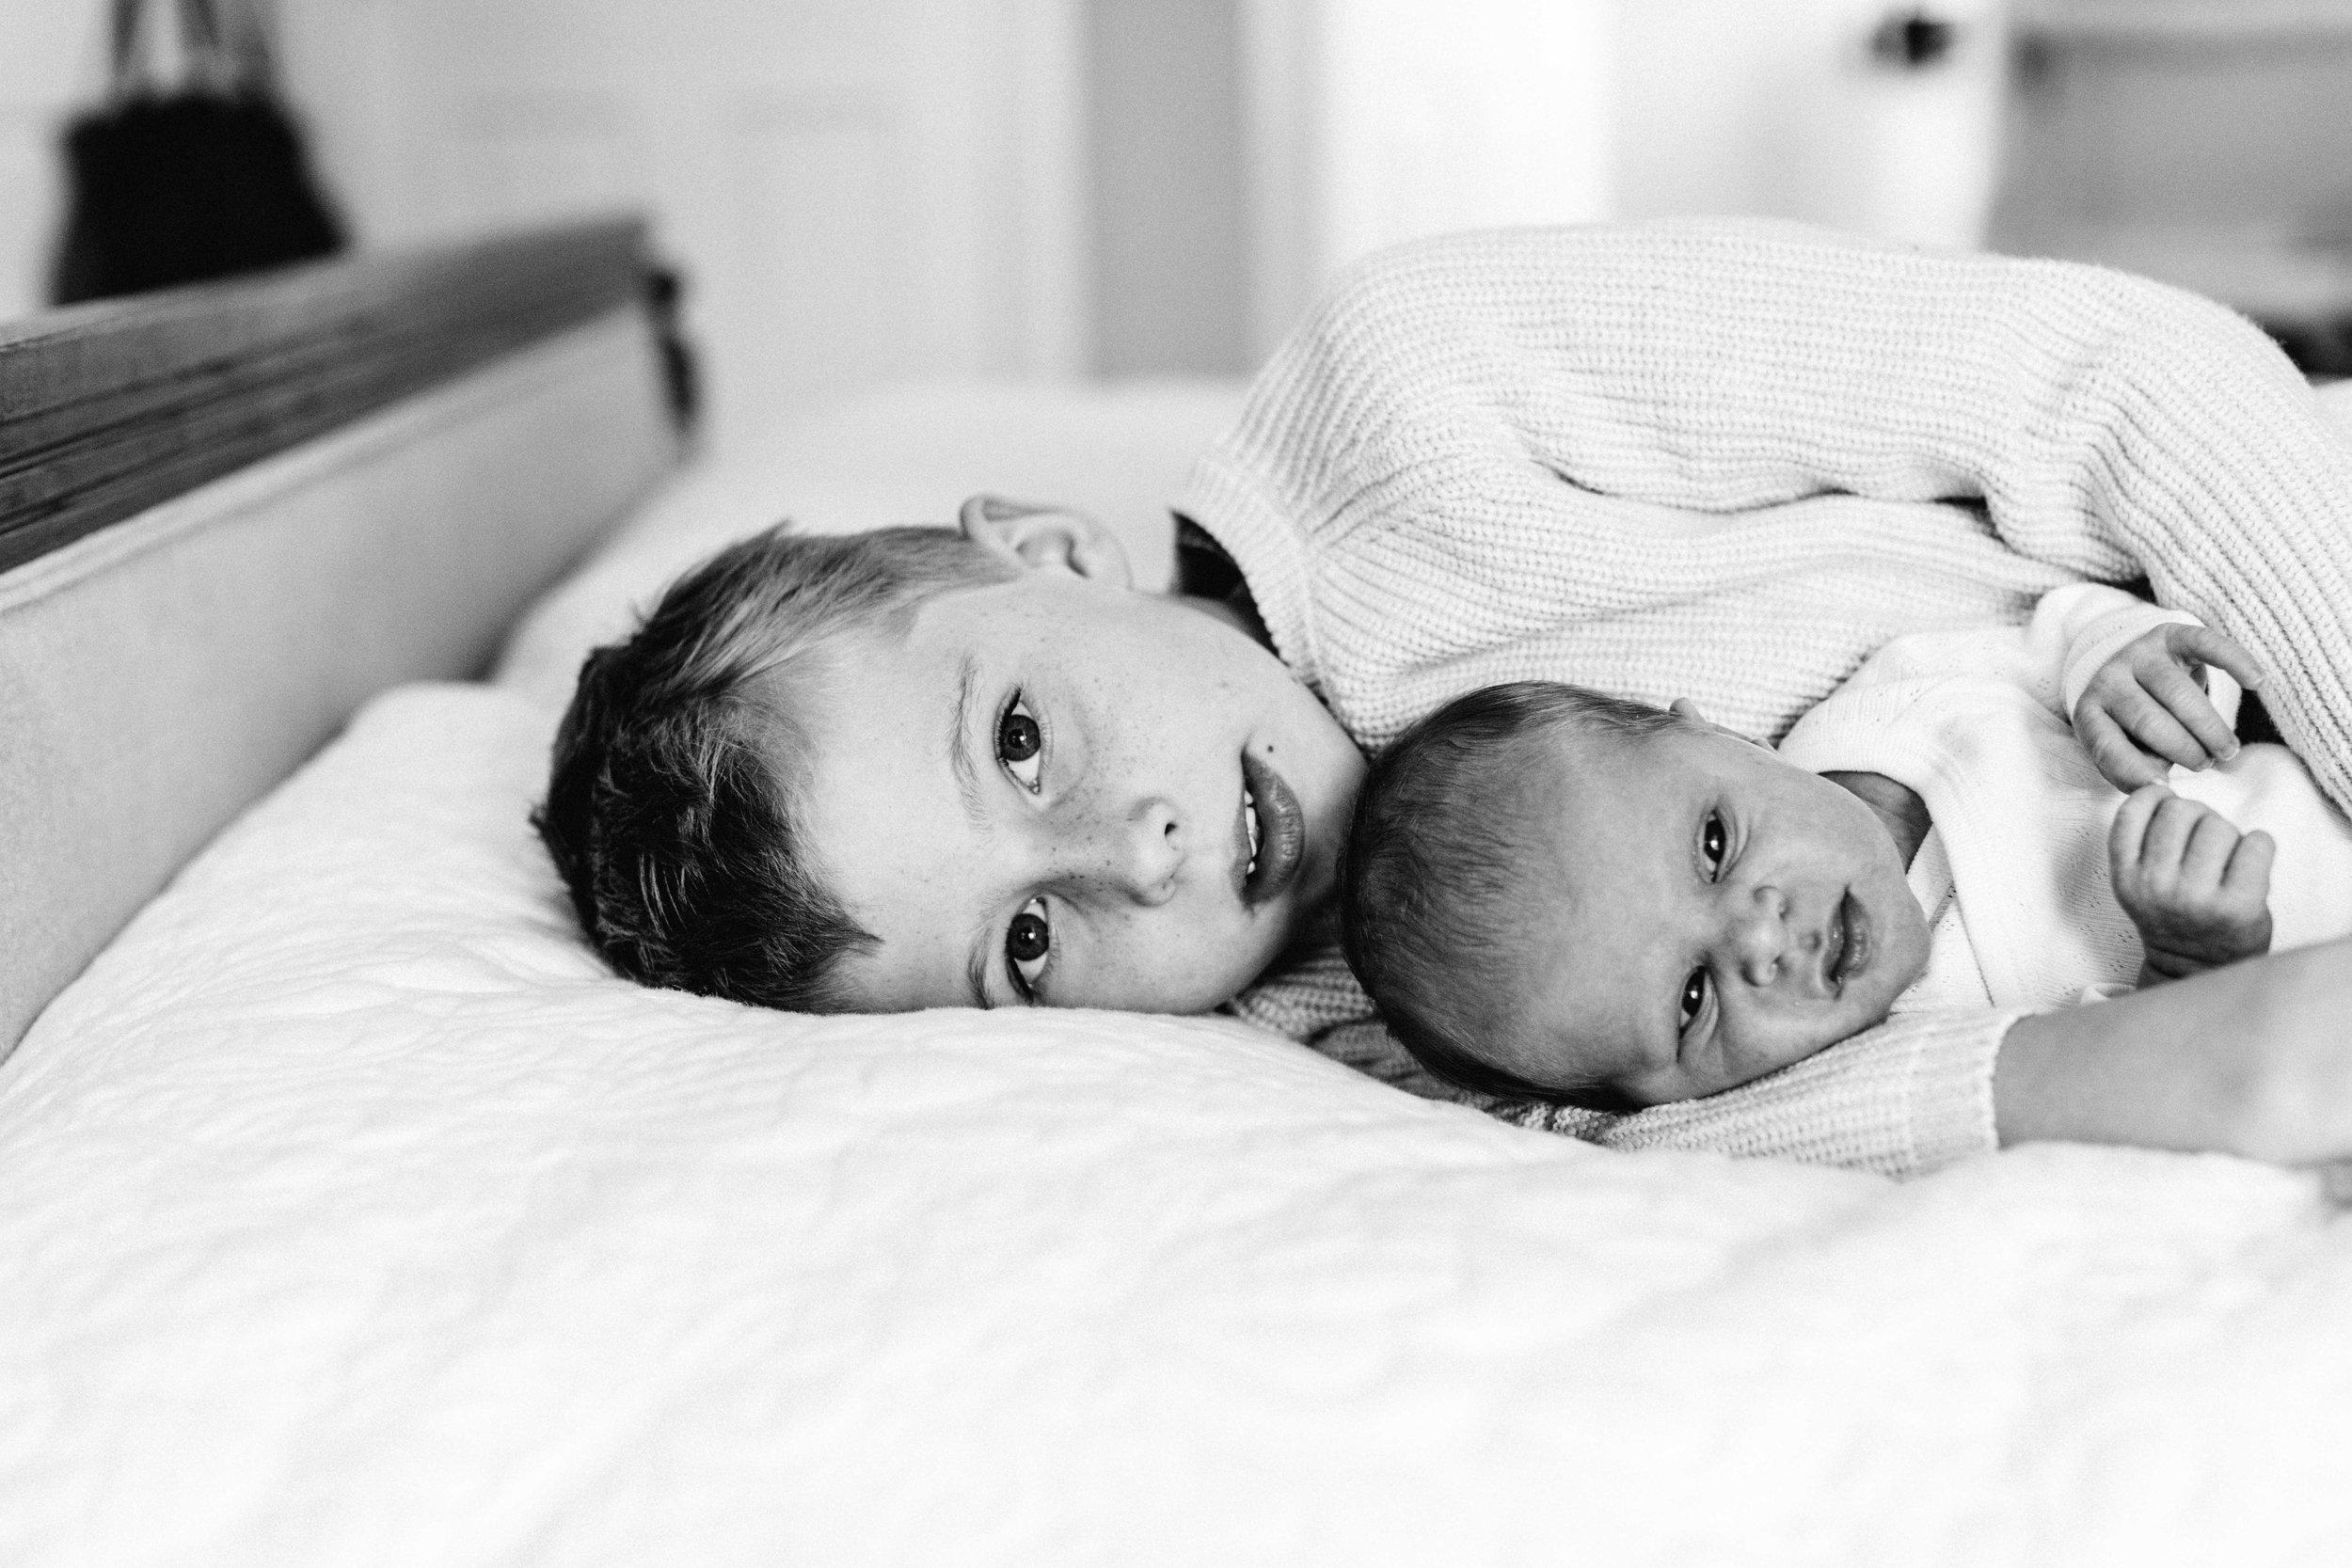 bowral-newborn-photographer-family-herrmann-southern-highlands-24.jpg